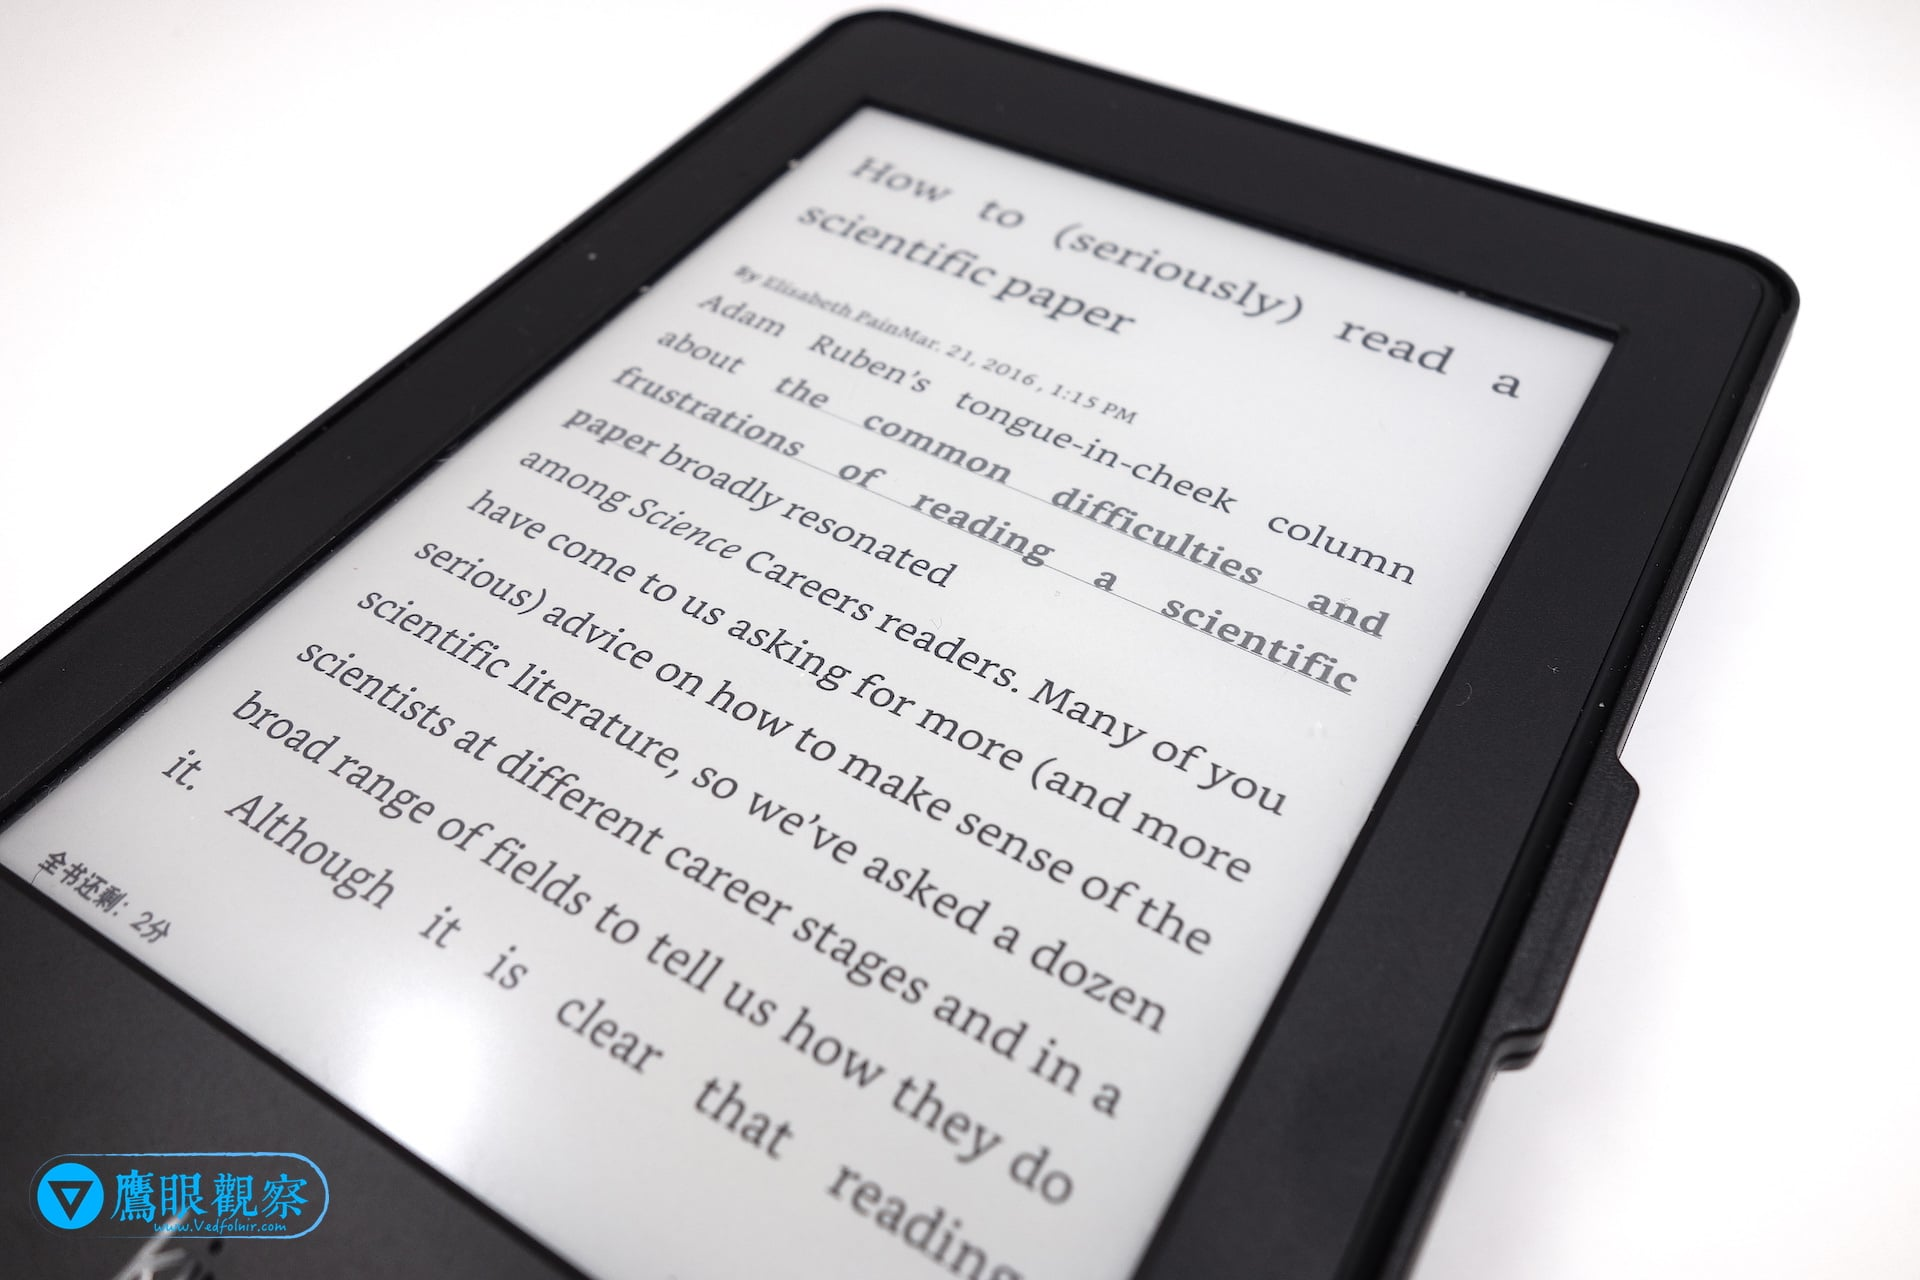 Amazon Kindle Document Content 將喜歡的文章「寄」給亞馬遜 Amazon Kindle 電子閱讀器的使用教學